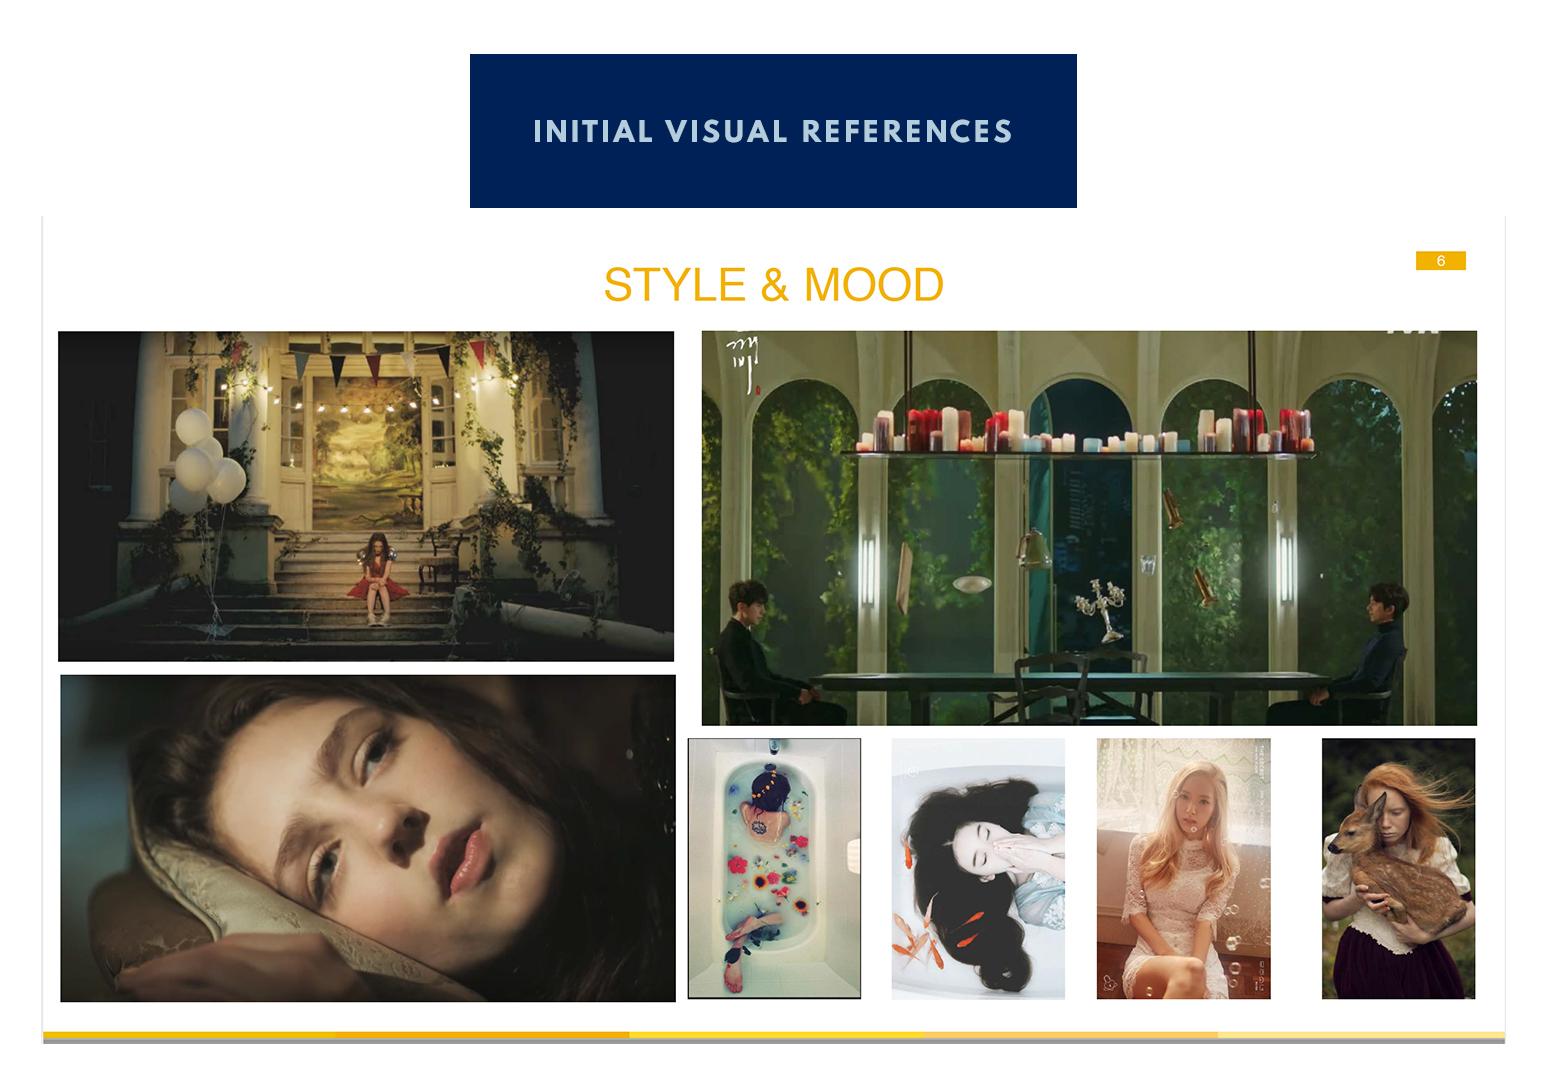 BrooklynIFAH-Visuals 2.jpg